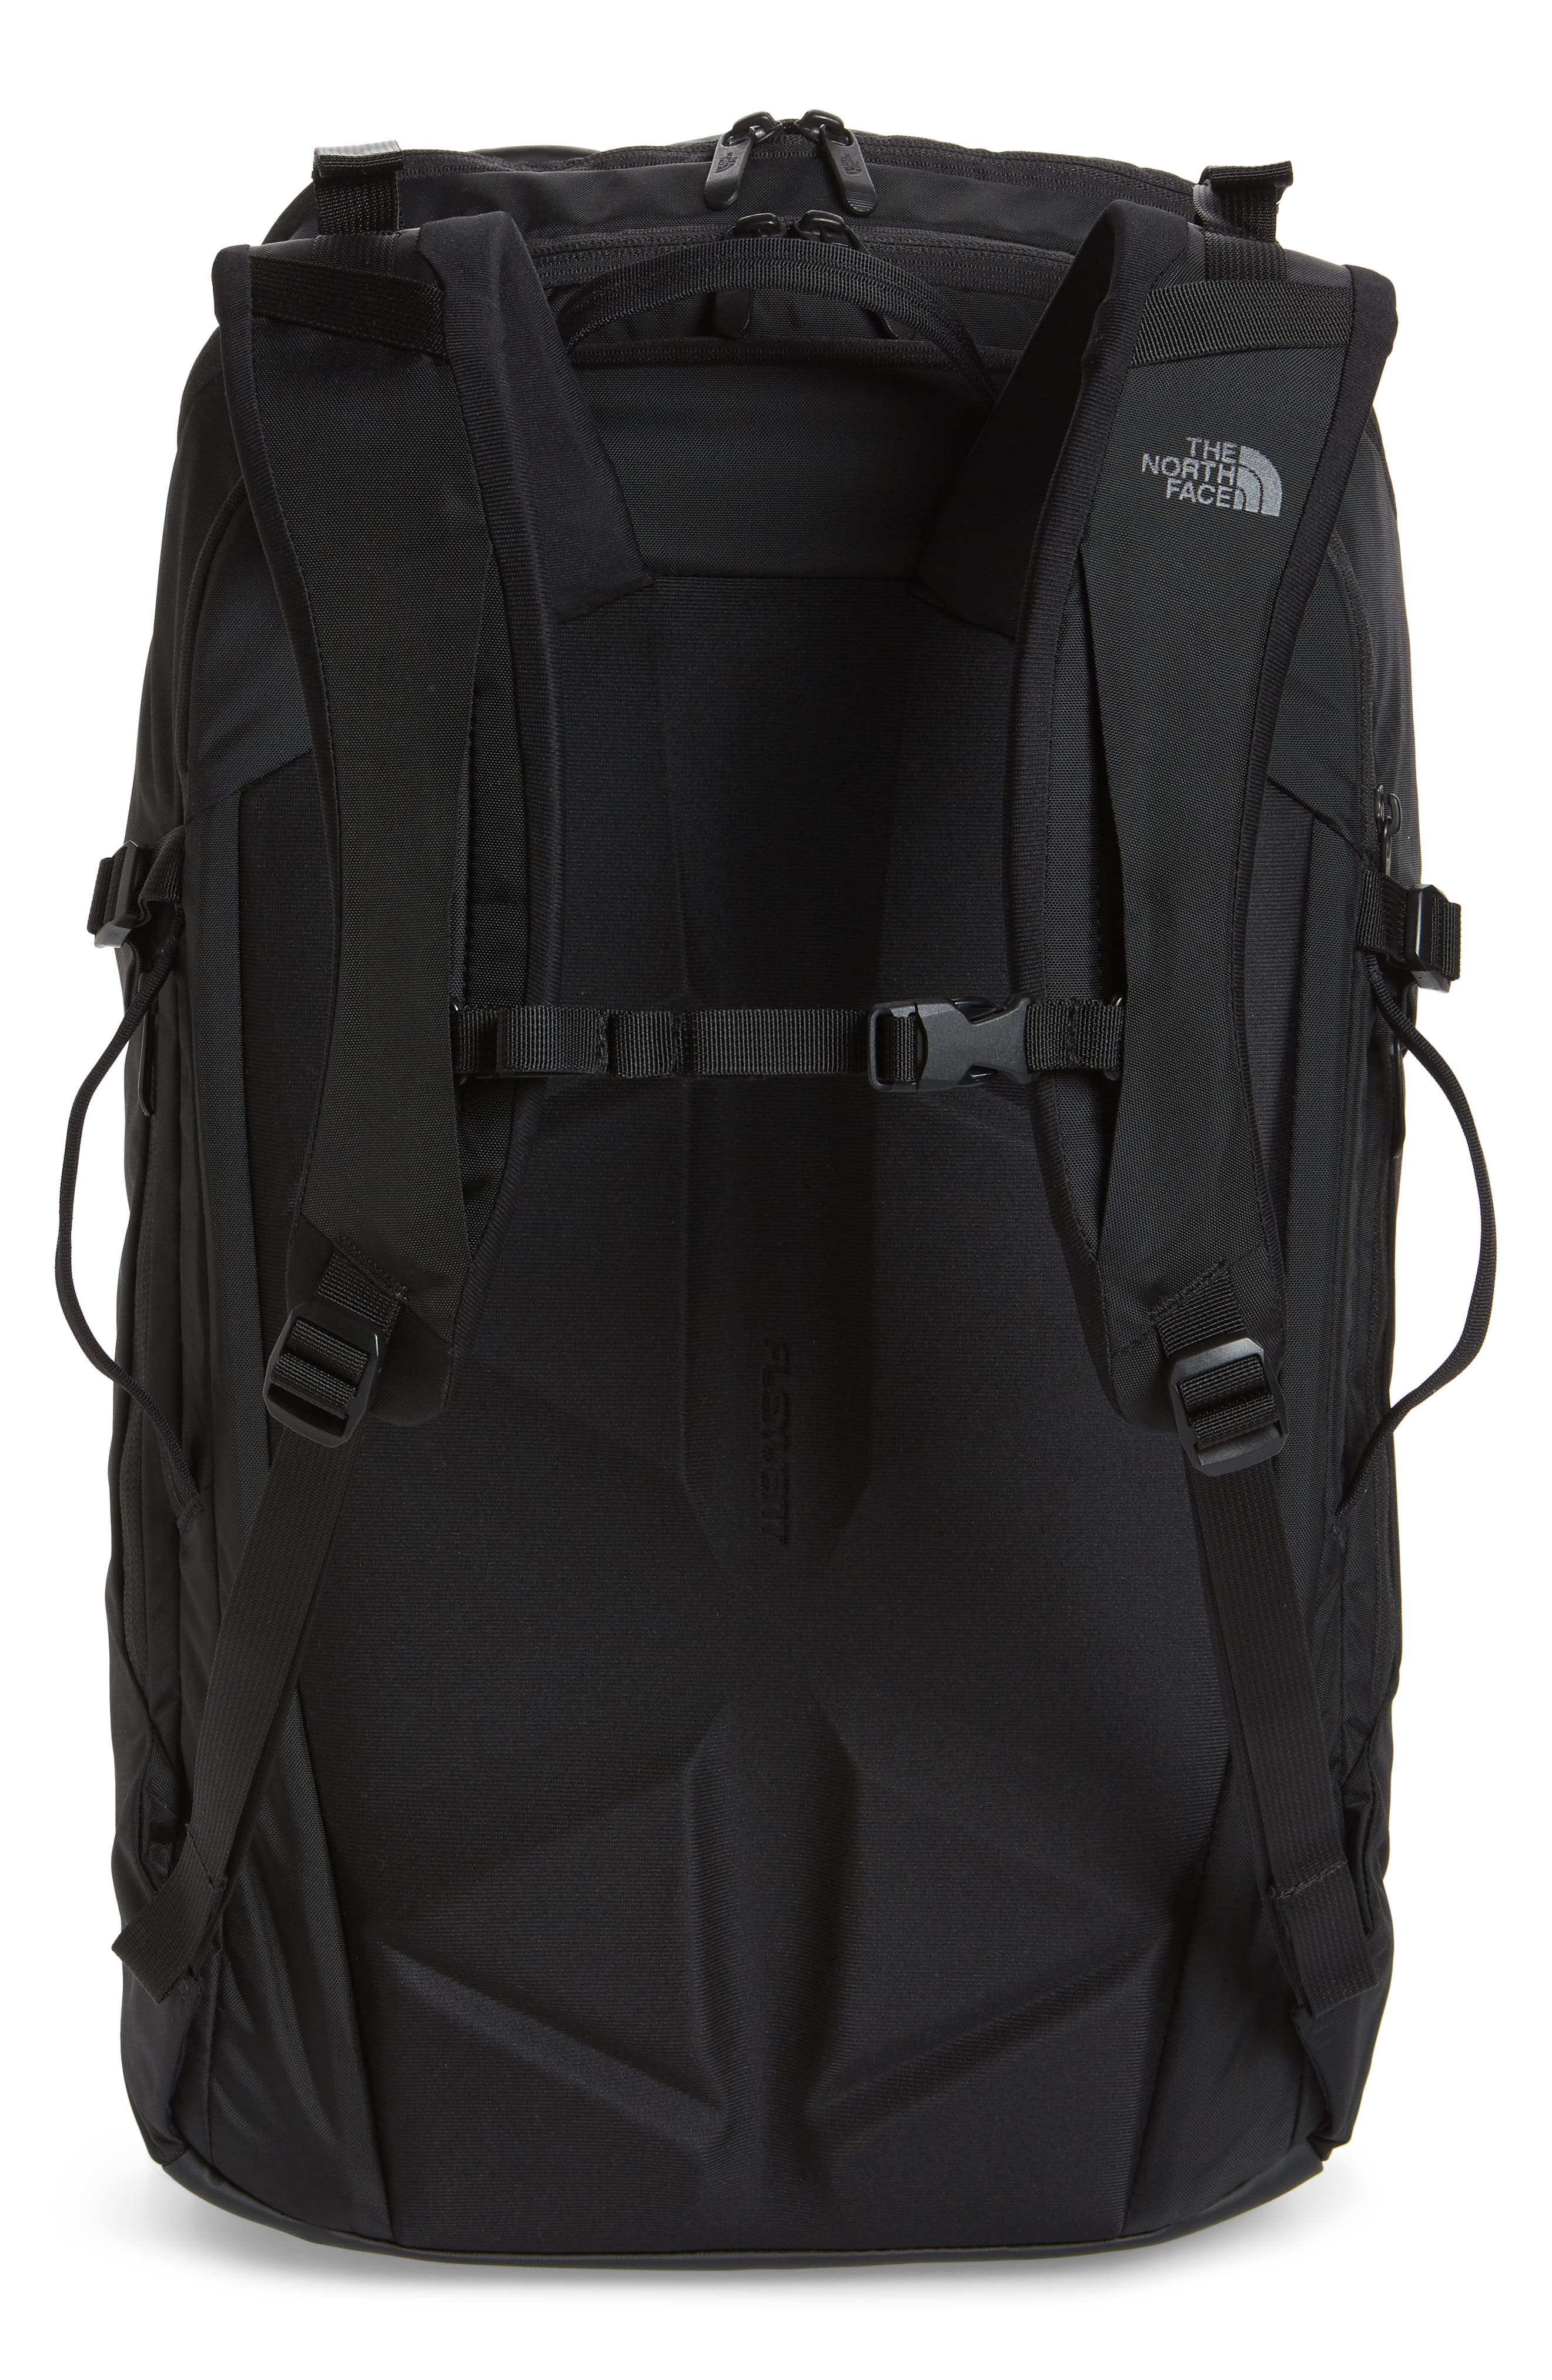 Kabig Backpack,                             Alternate thumbnail 3, color,                             001